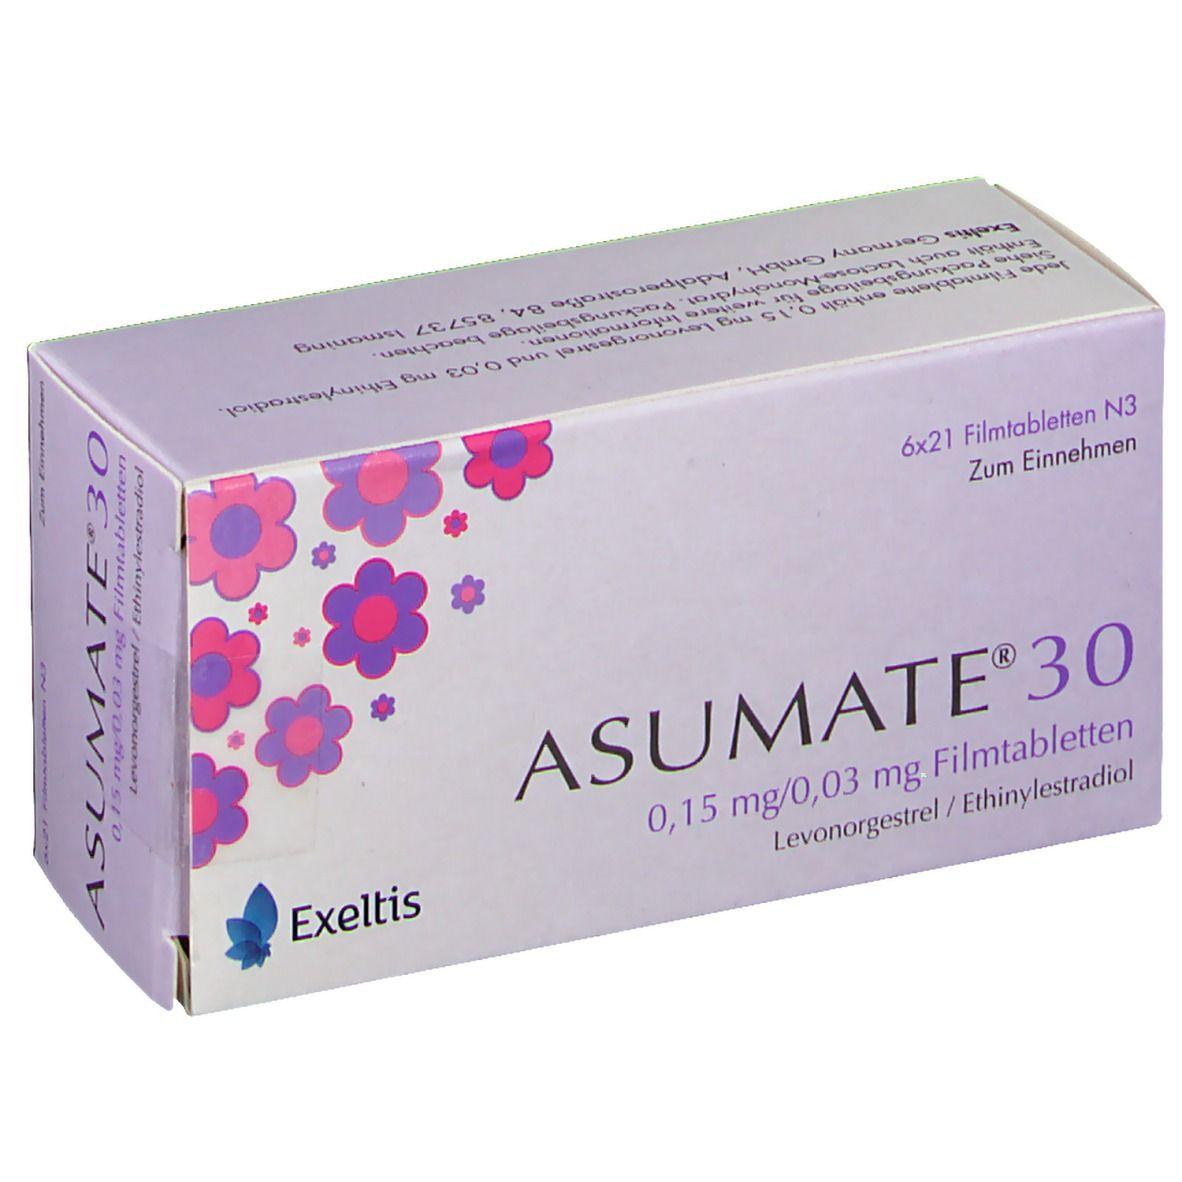 Asumate 30 gewichtszunahme